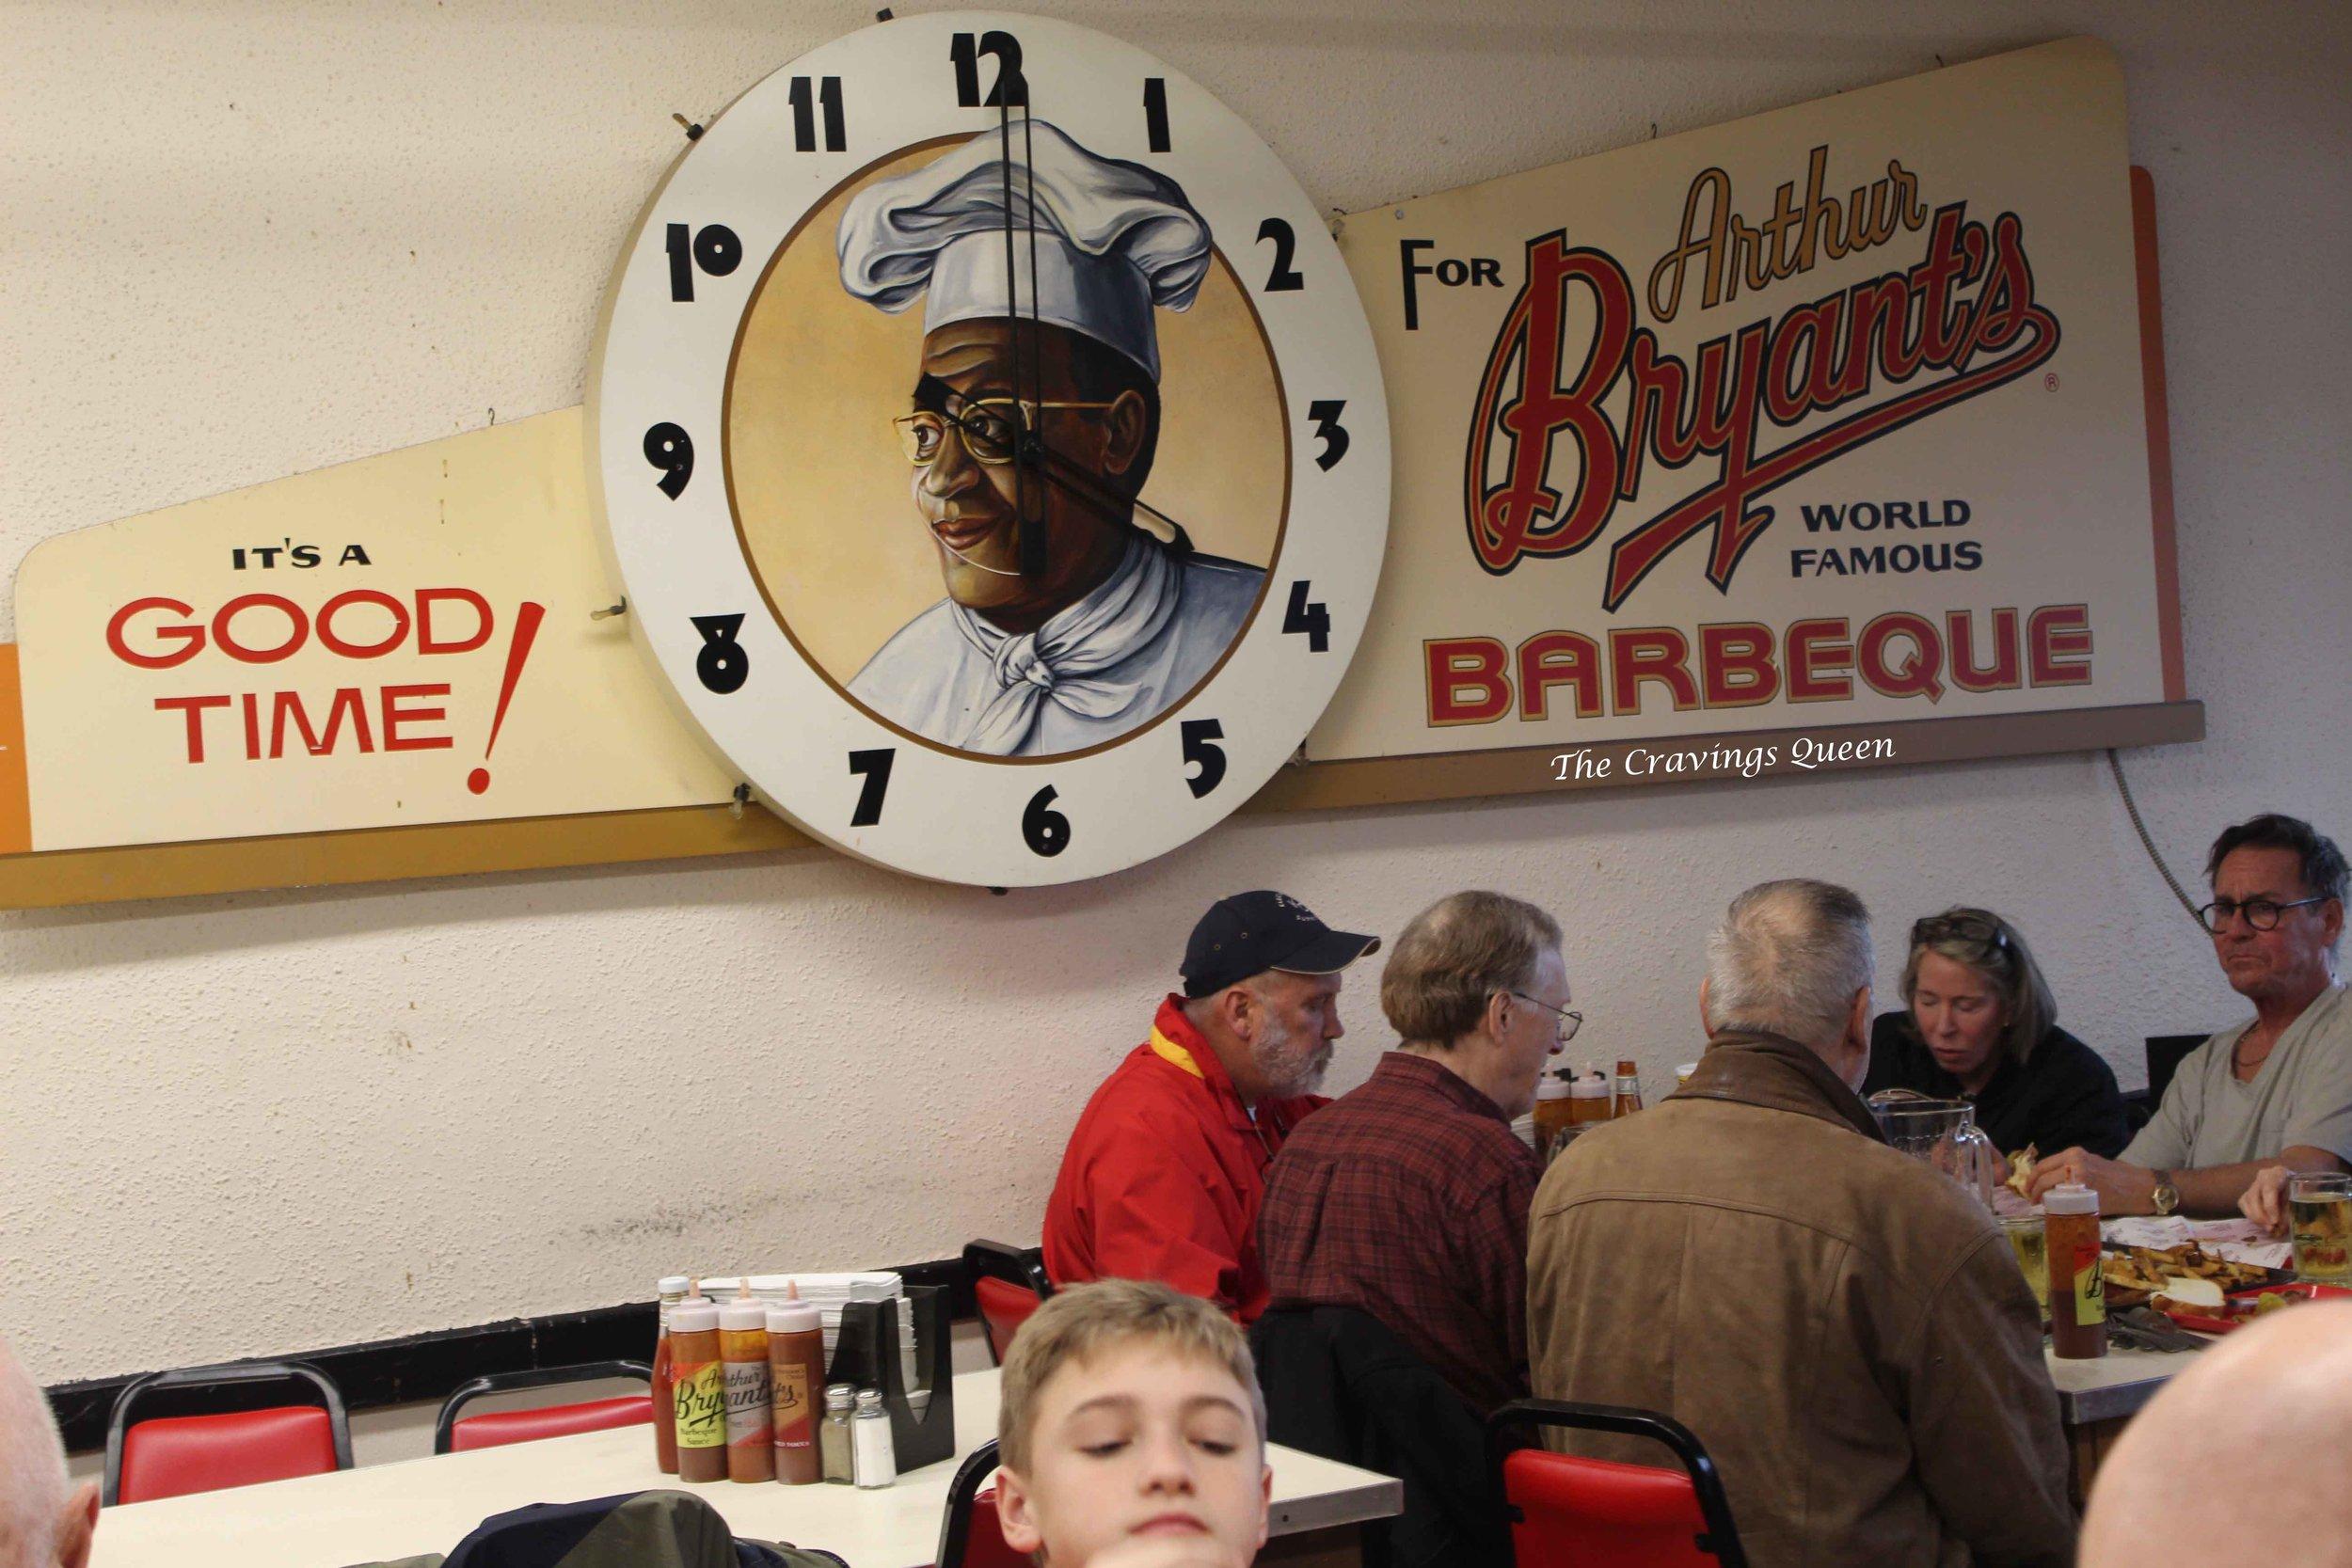 Arthur-Bryants-dining-room.jpg